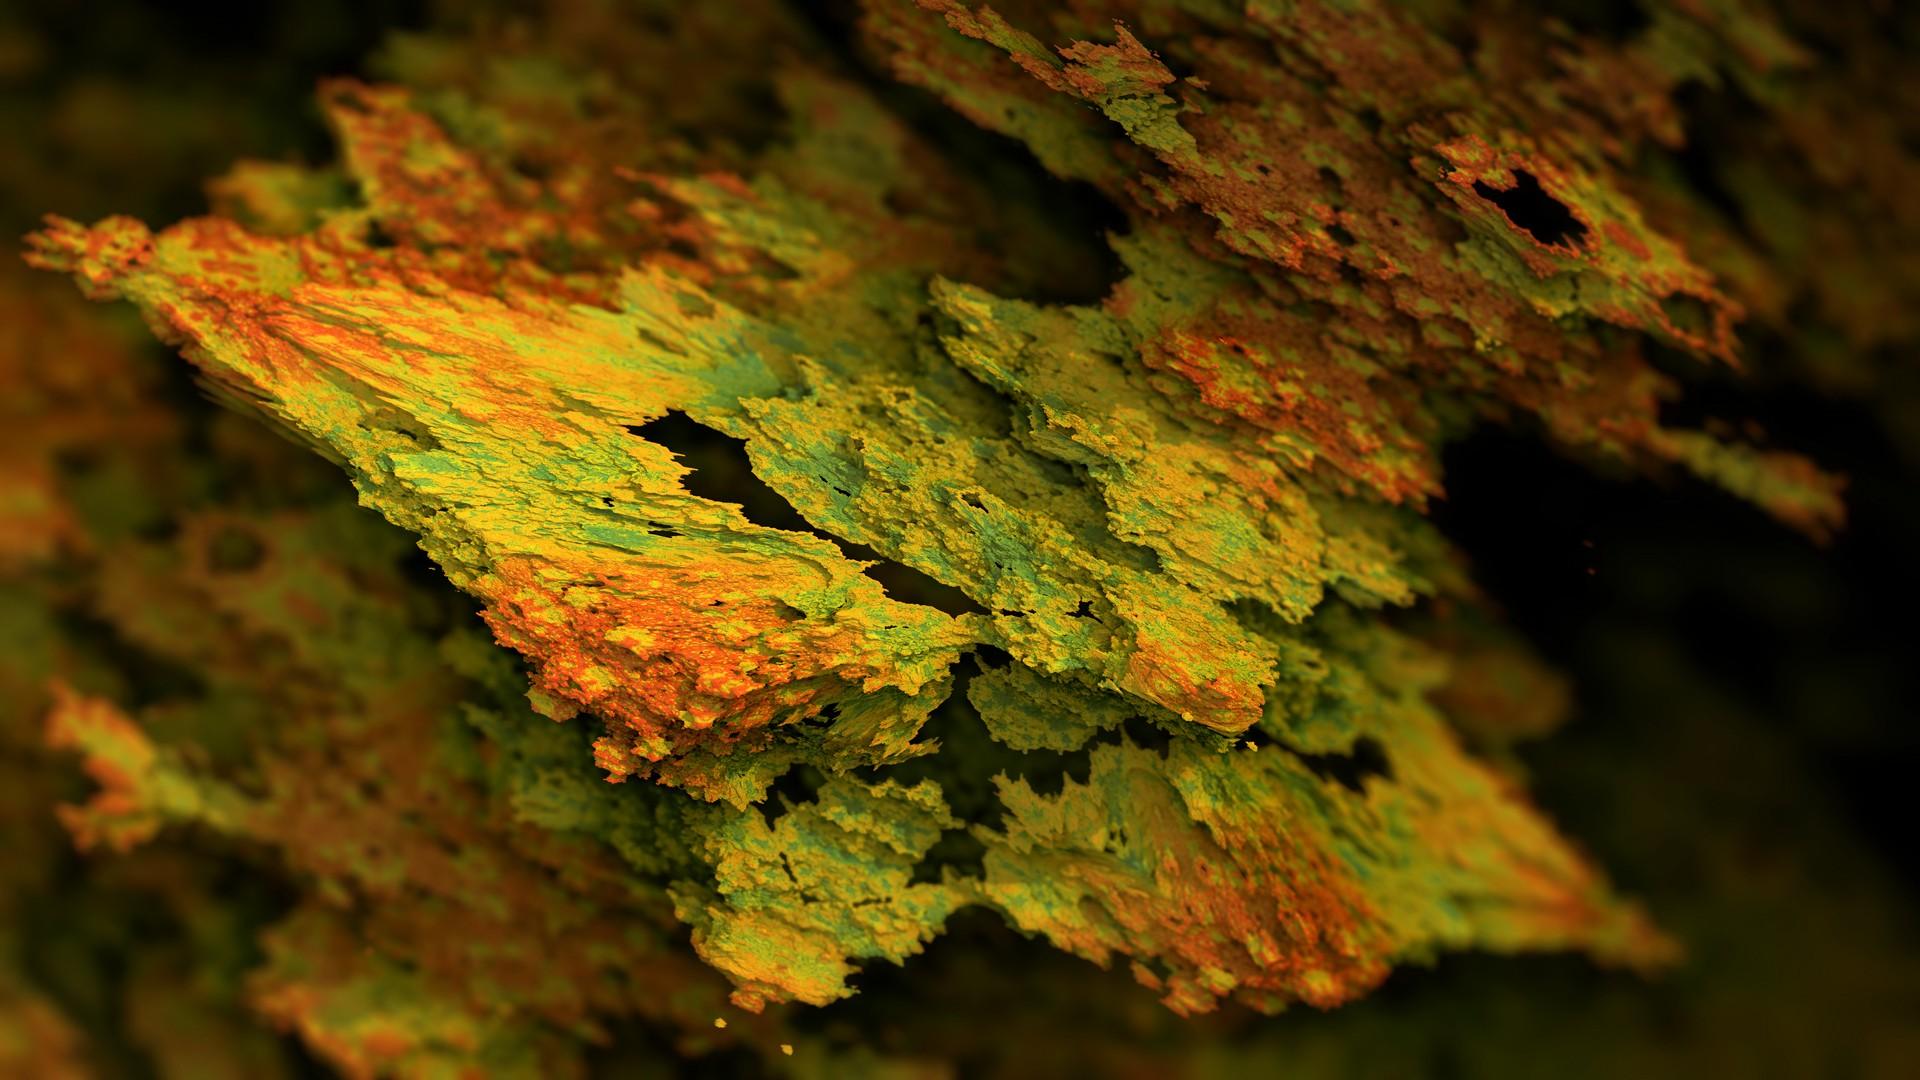 General 1920x1080 Procedural Minerals mineral CGI artwork abstract digital art